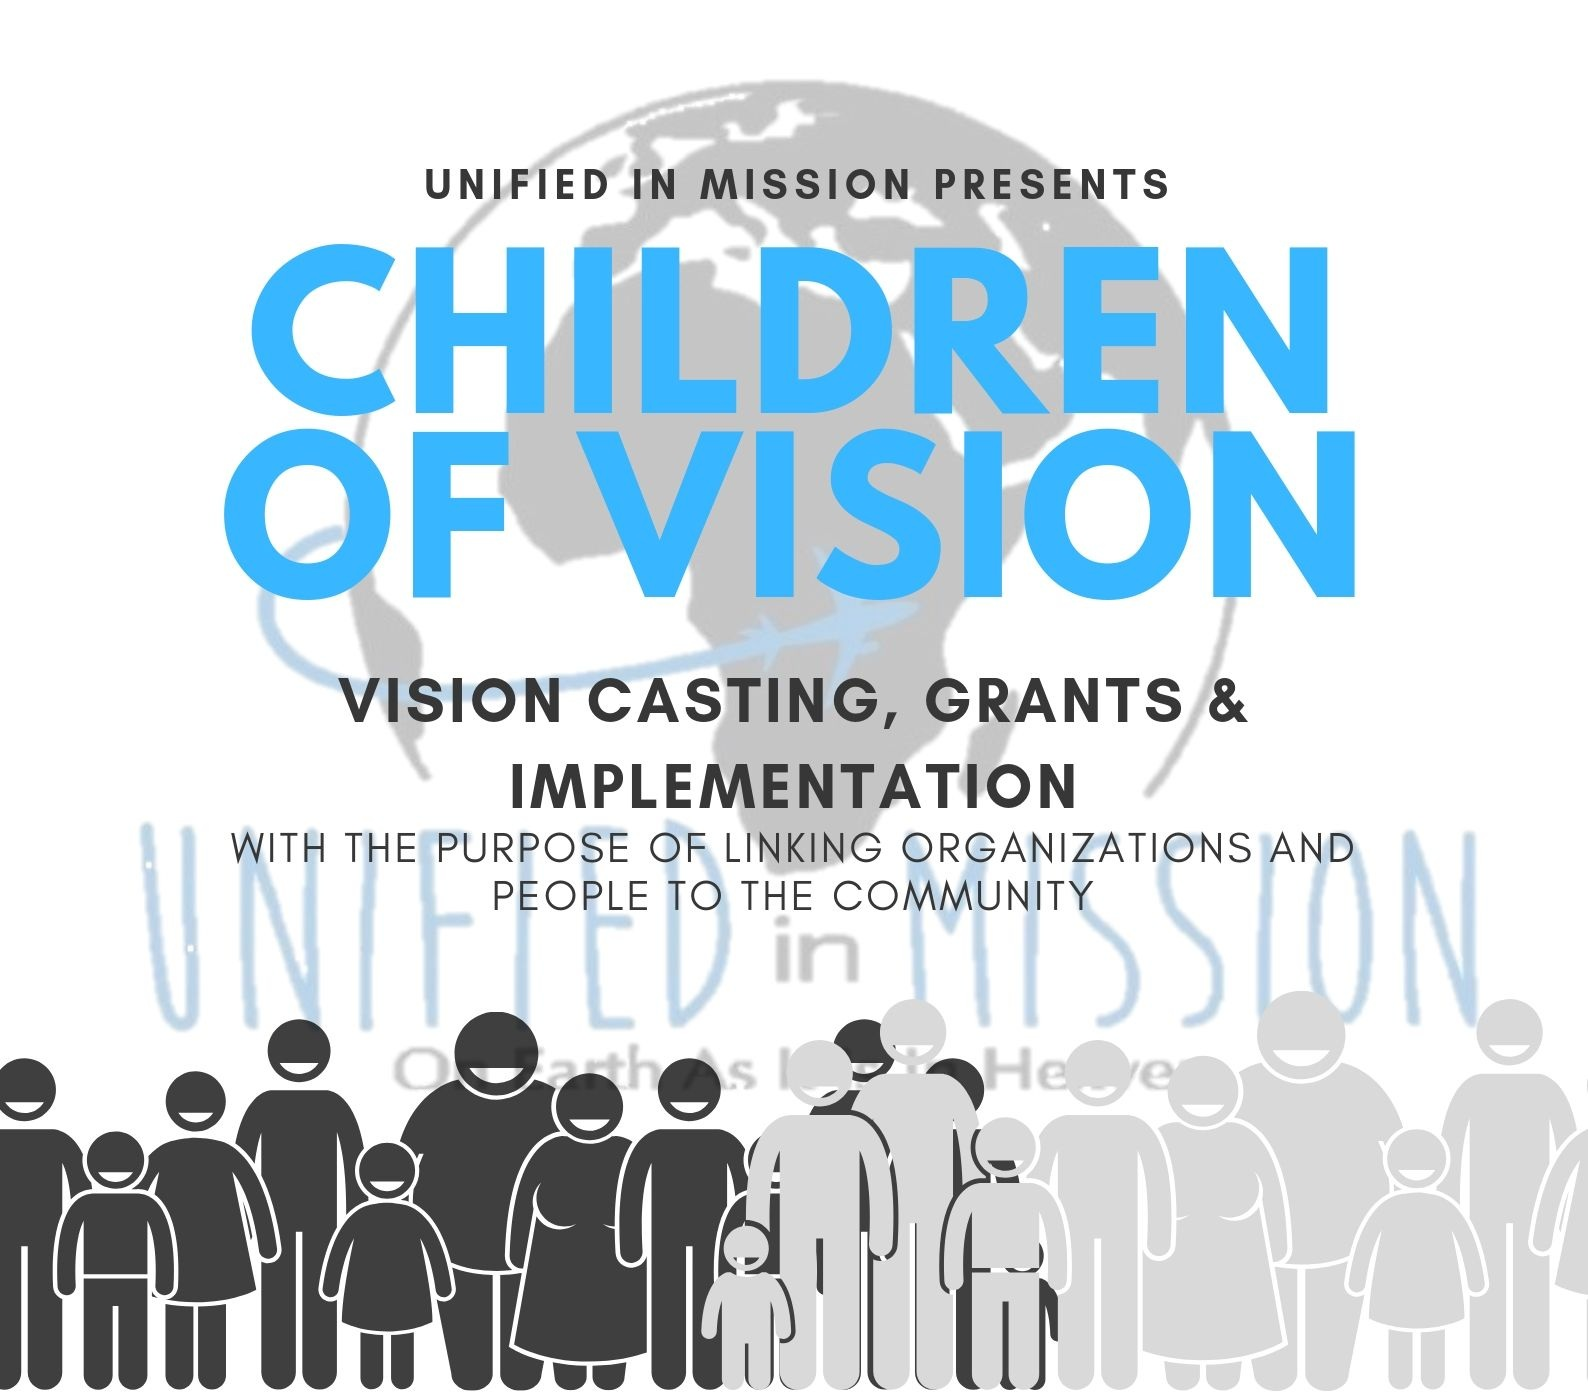 Copy+of+Children+of+Vision+1.jpg